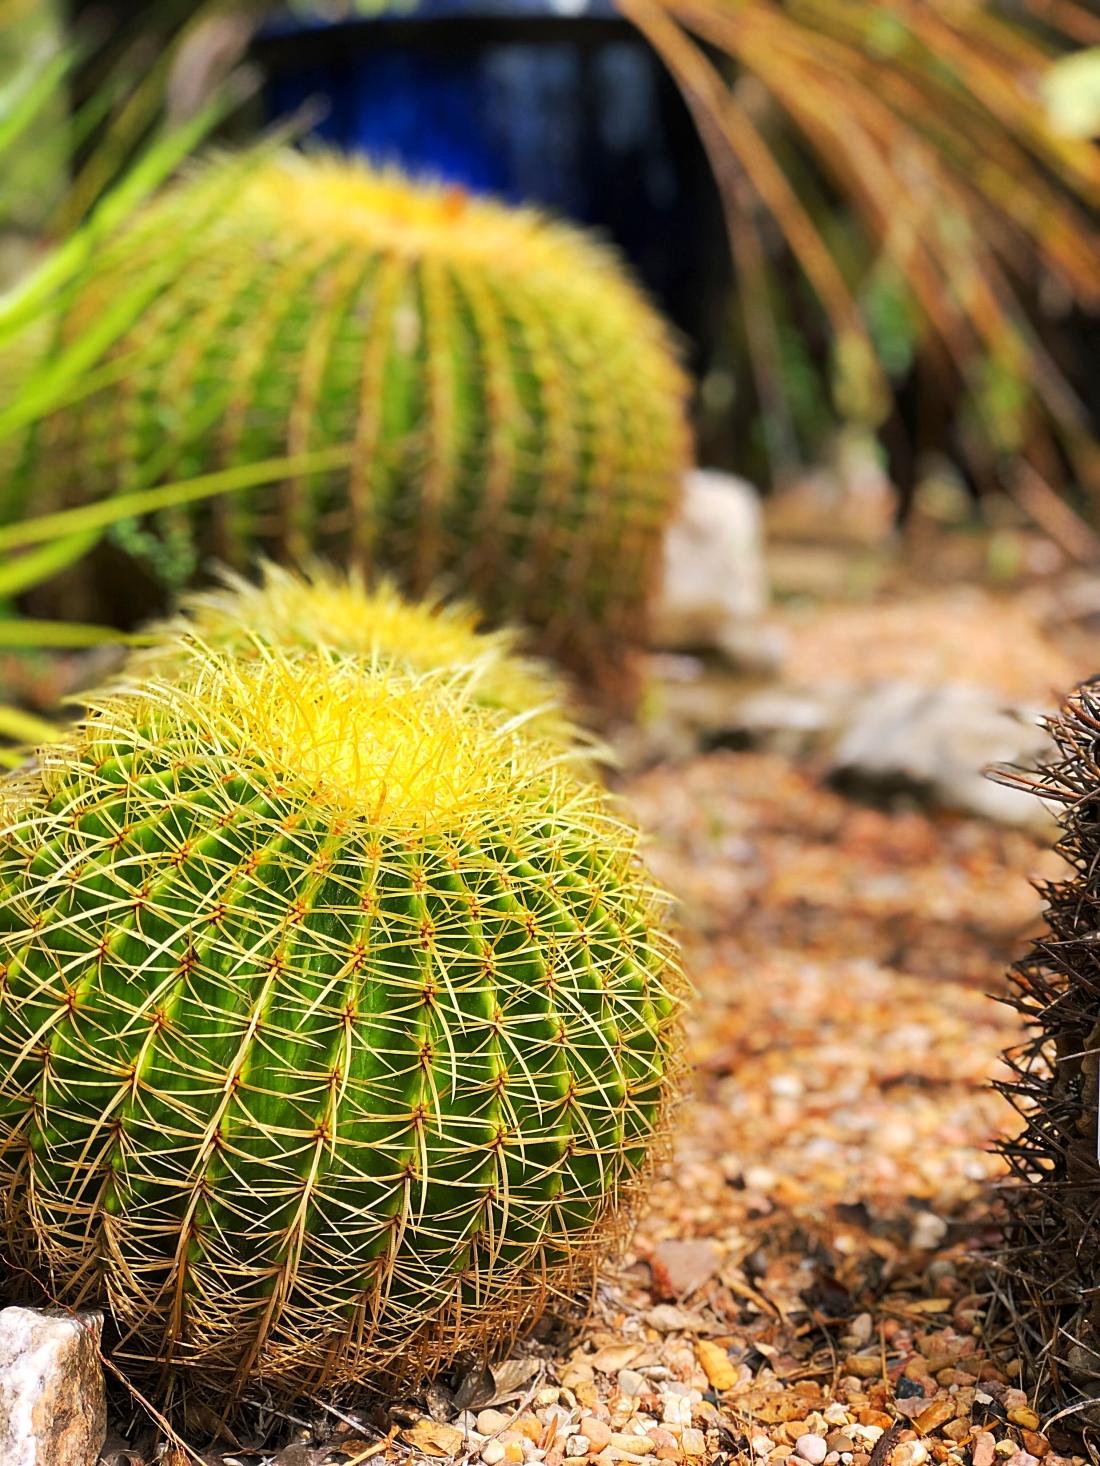 Cactus - Zilker Botanical Garden in Austin, Texas